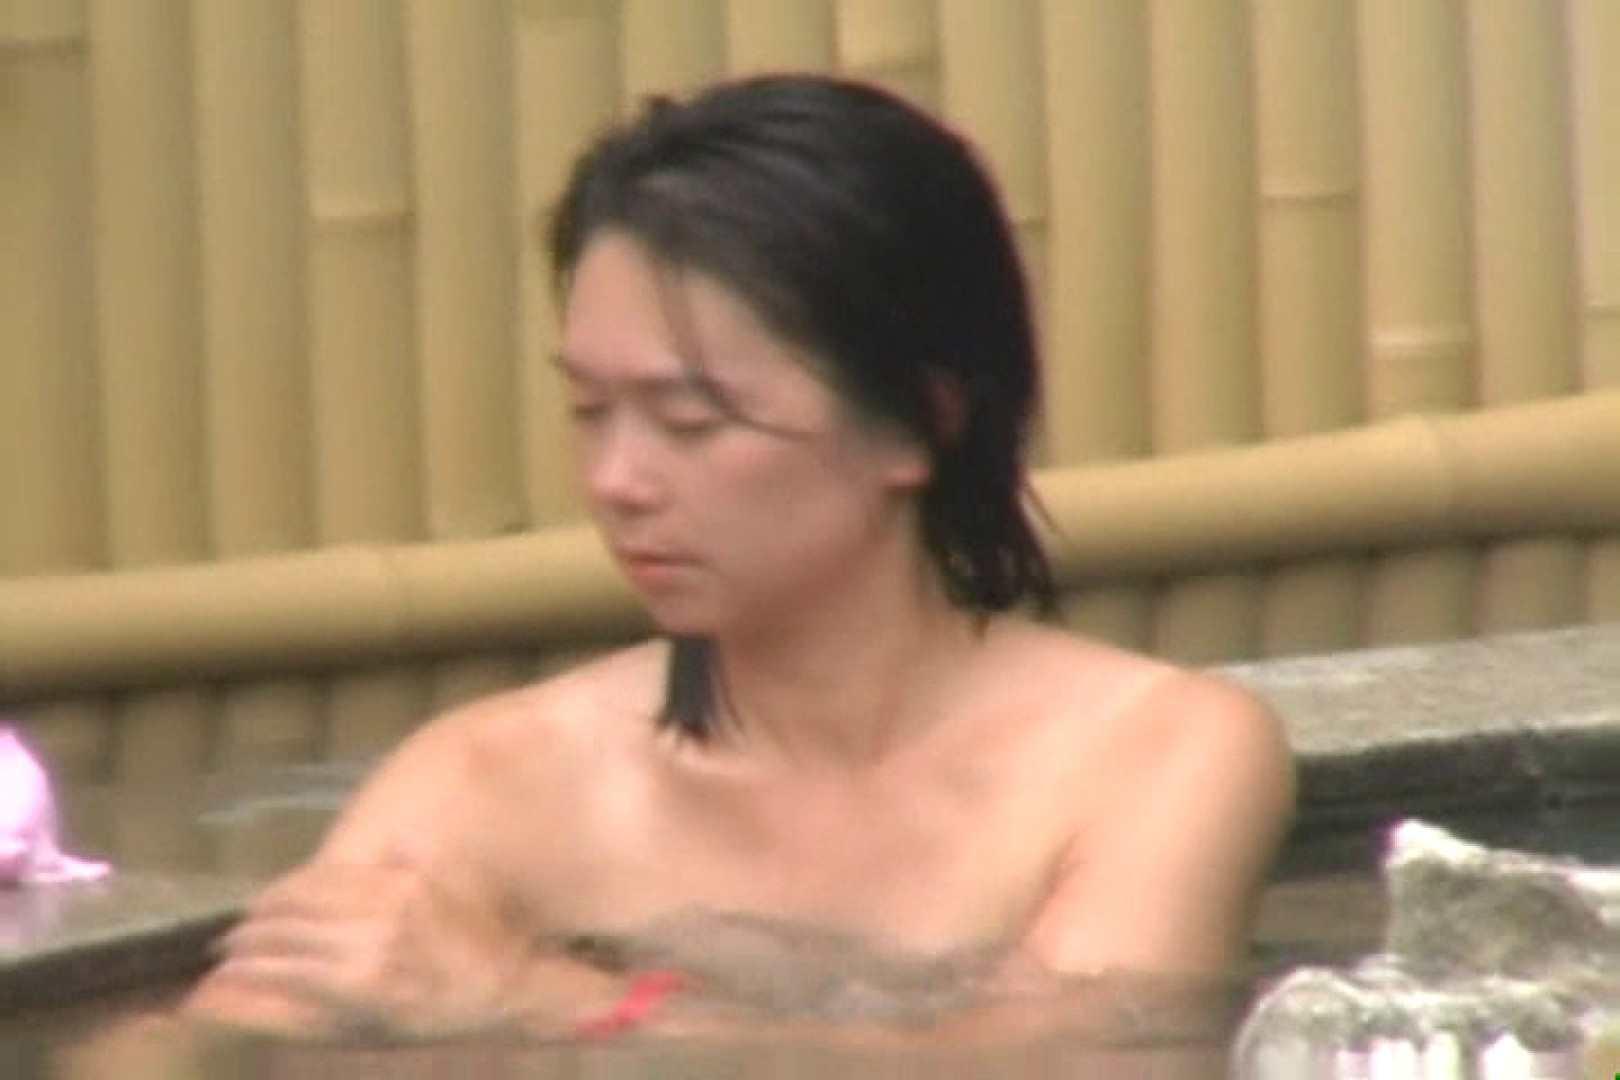 Aquaな露天風呂Vol.619 HなOL オマンコ動画キャプチャ 107pic 67